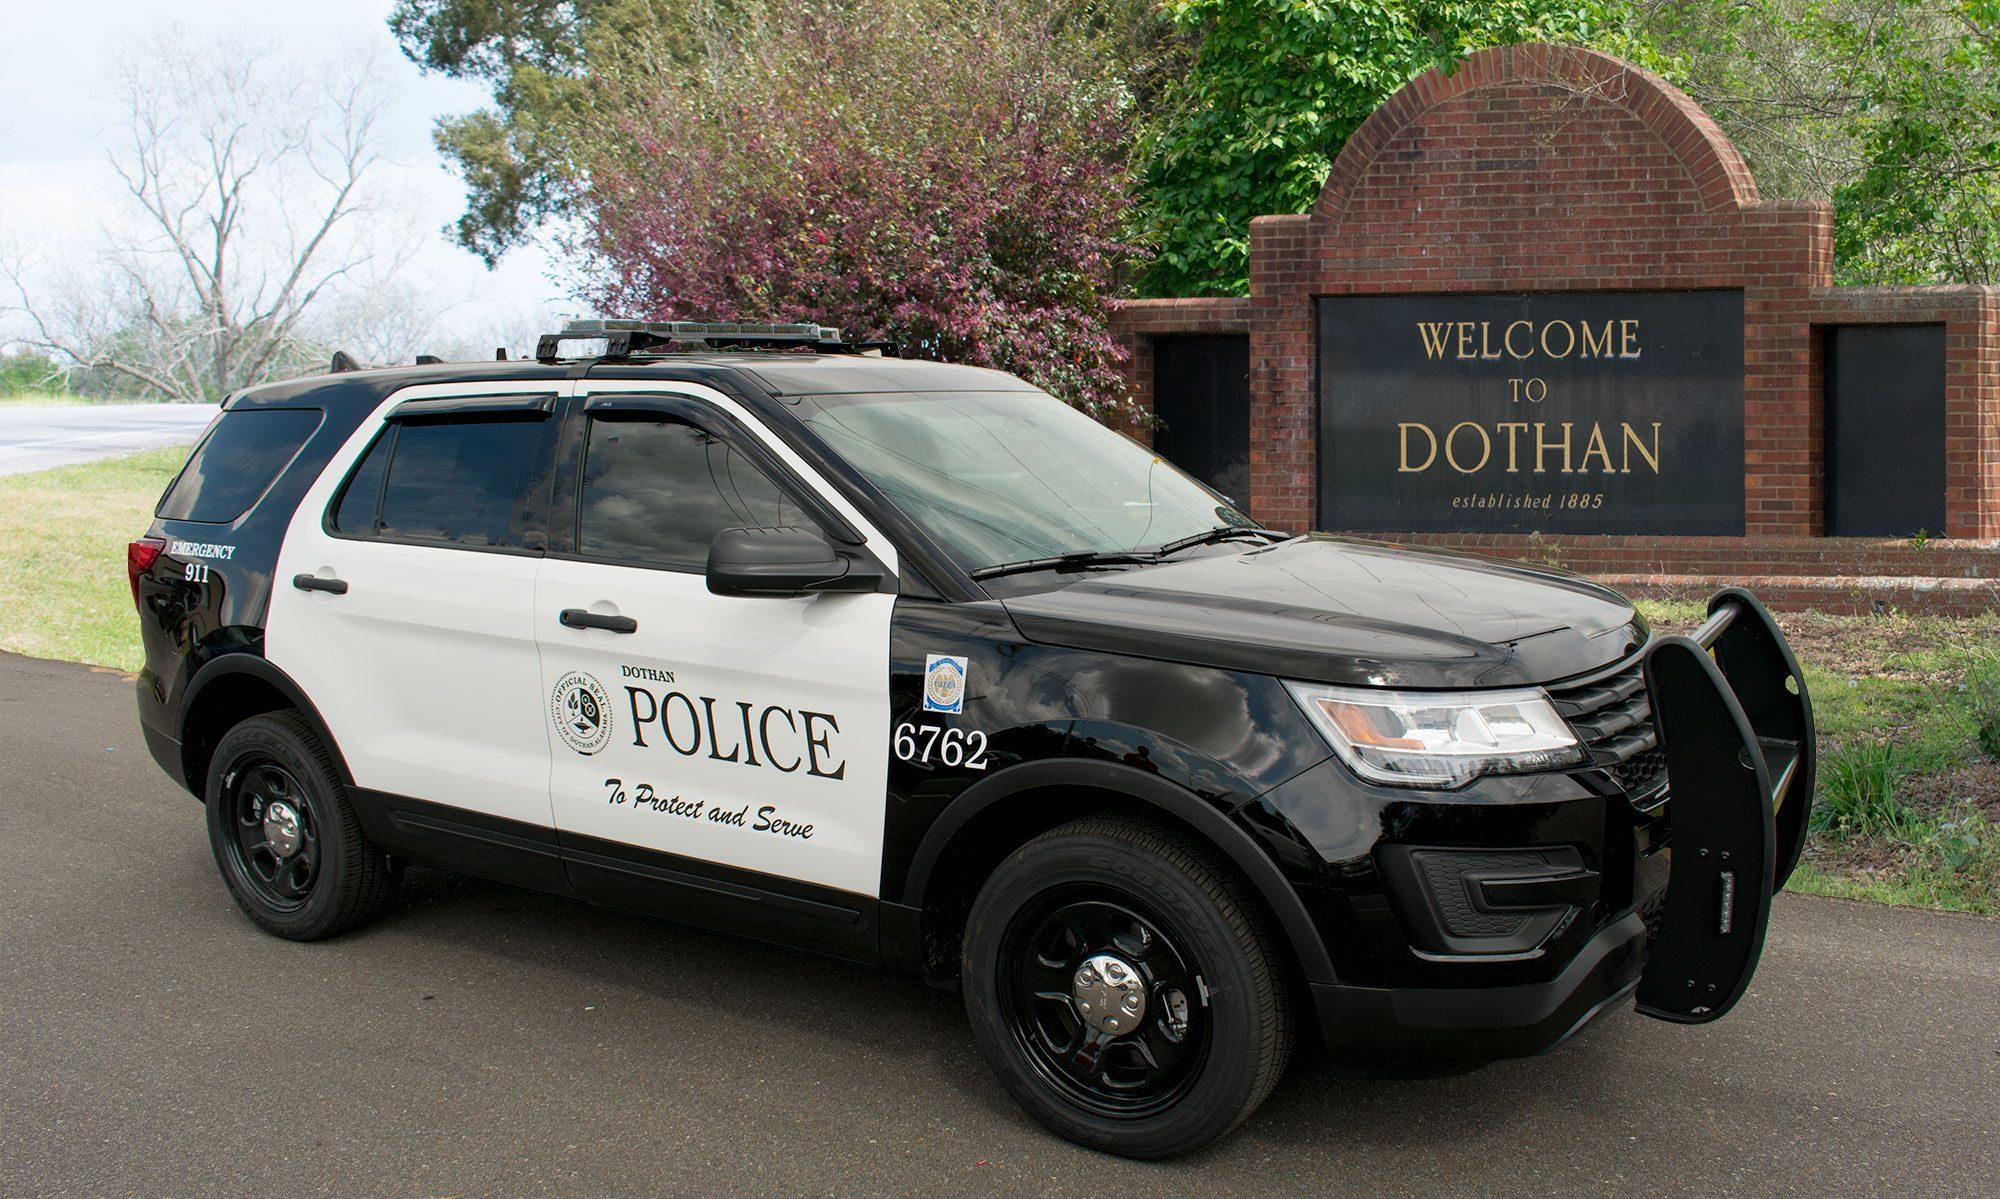 Dothan Police Department